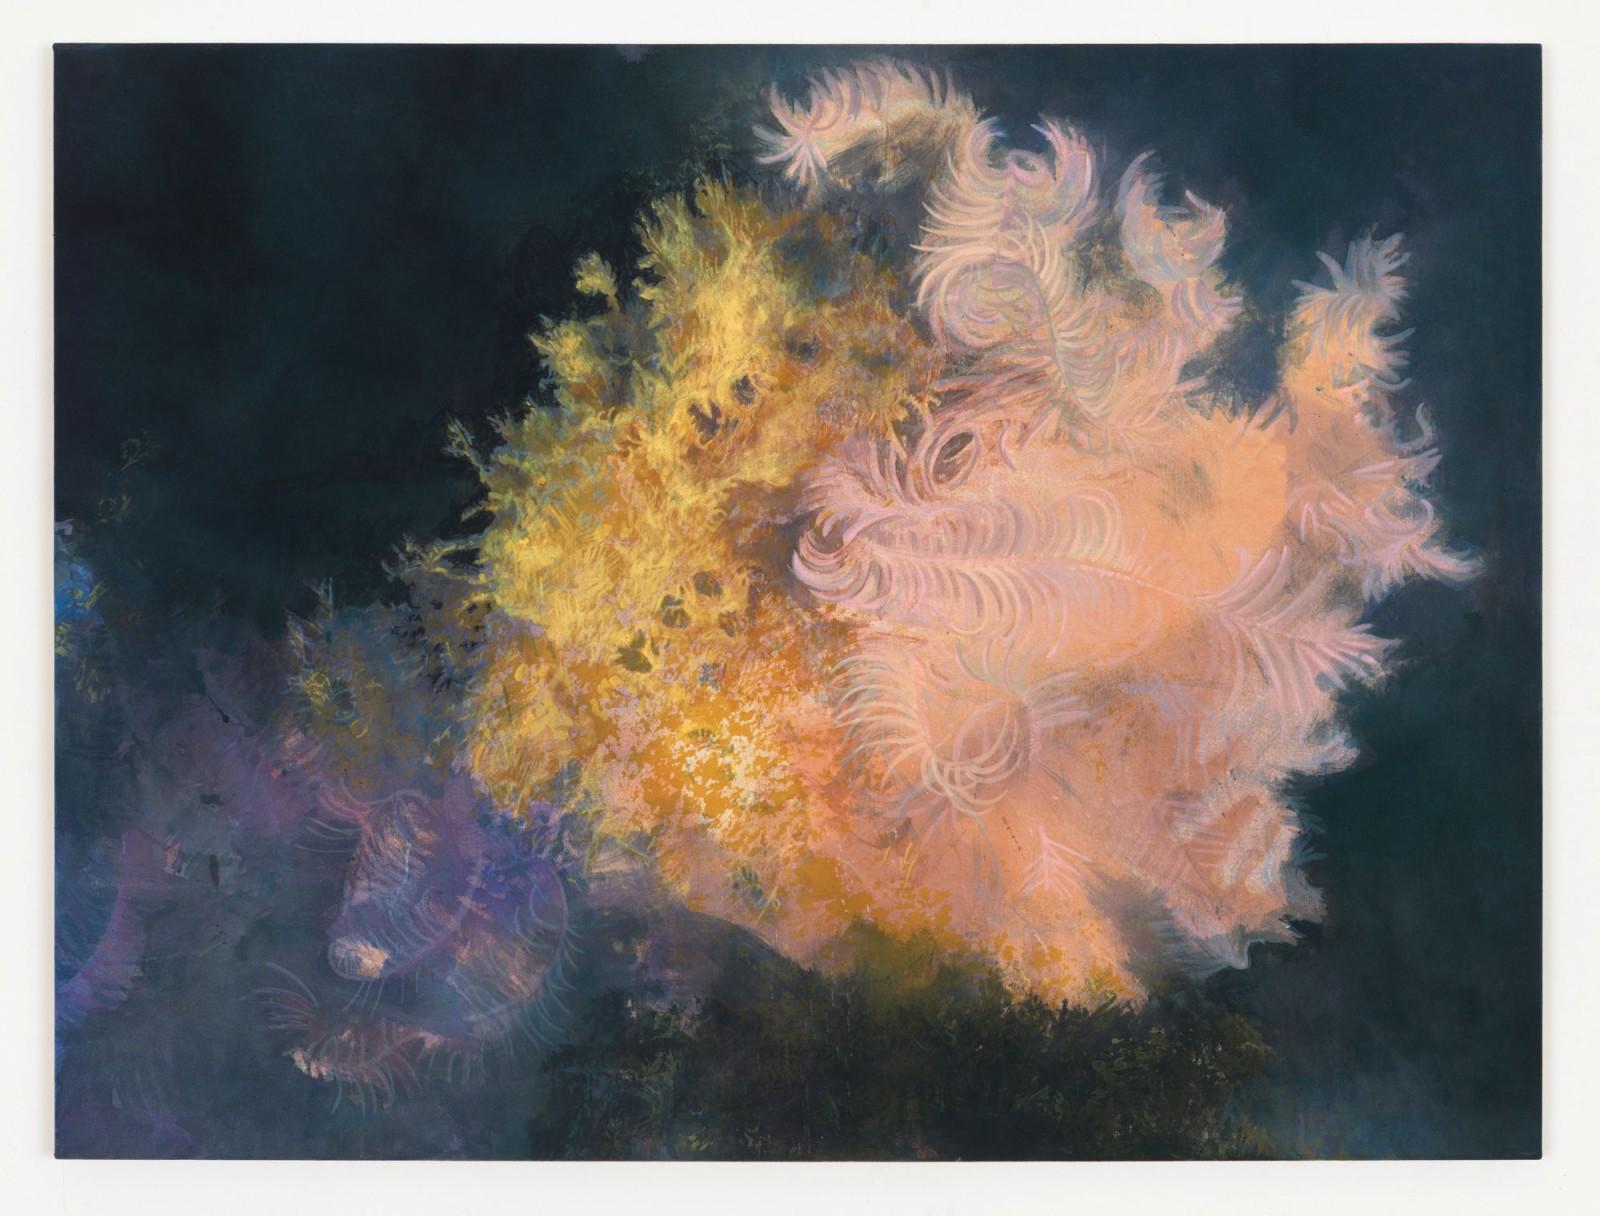 Kim Nekarda: untitled, 2015, vinyl color & body print on cotton, 90 x 120 cm, private collection, zurich